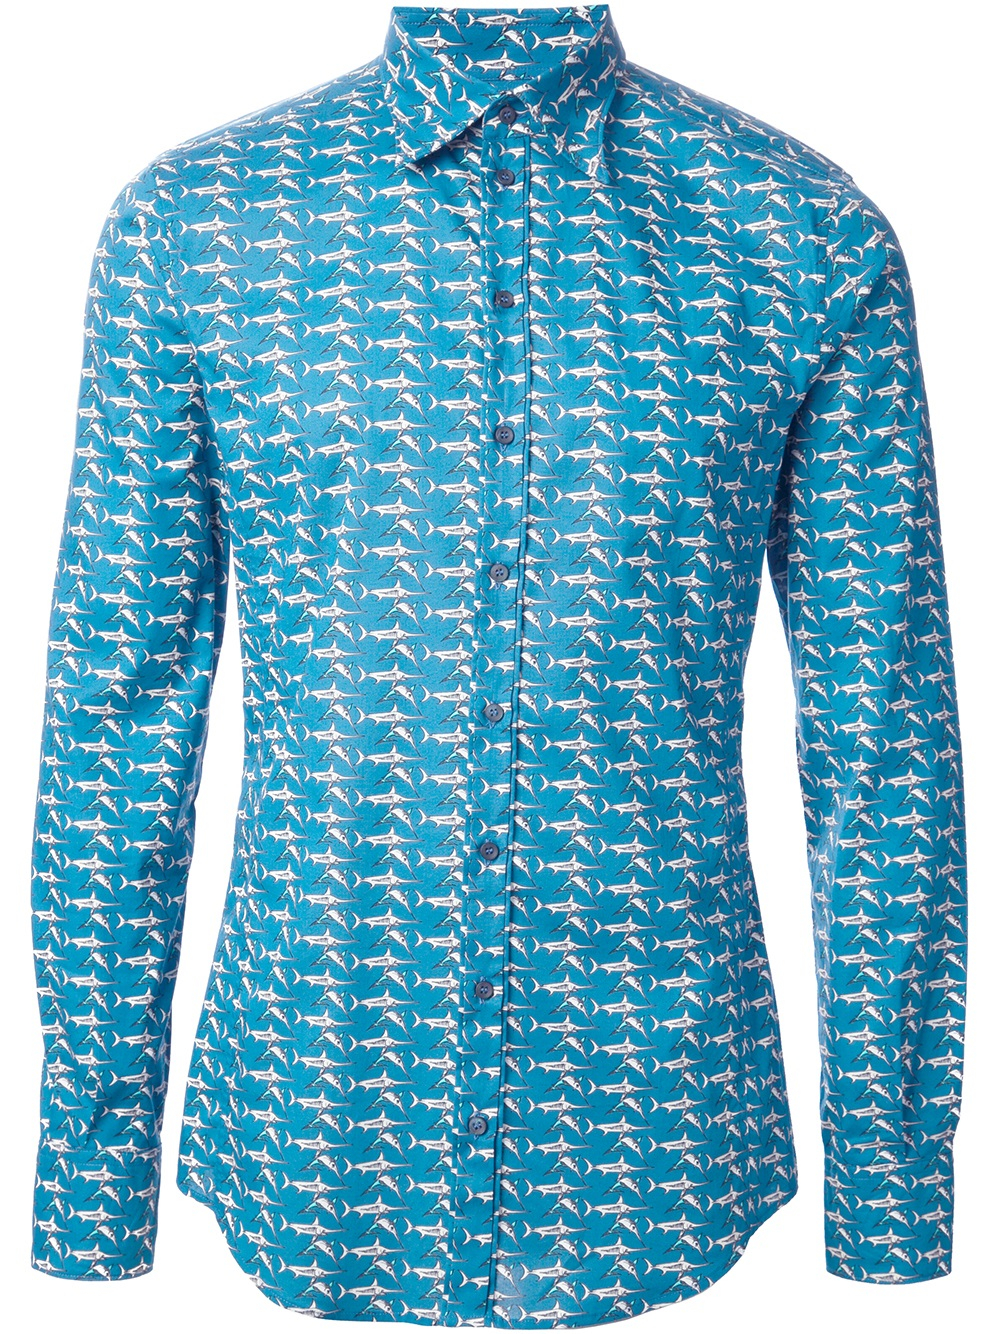 Dolce Gabbana Sword Fish Print Shirt In Blue For Men Lyst